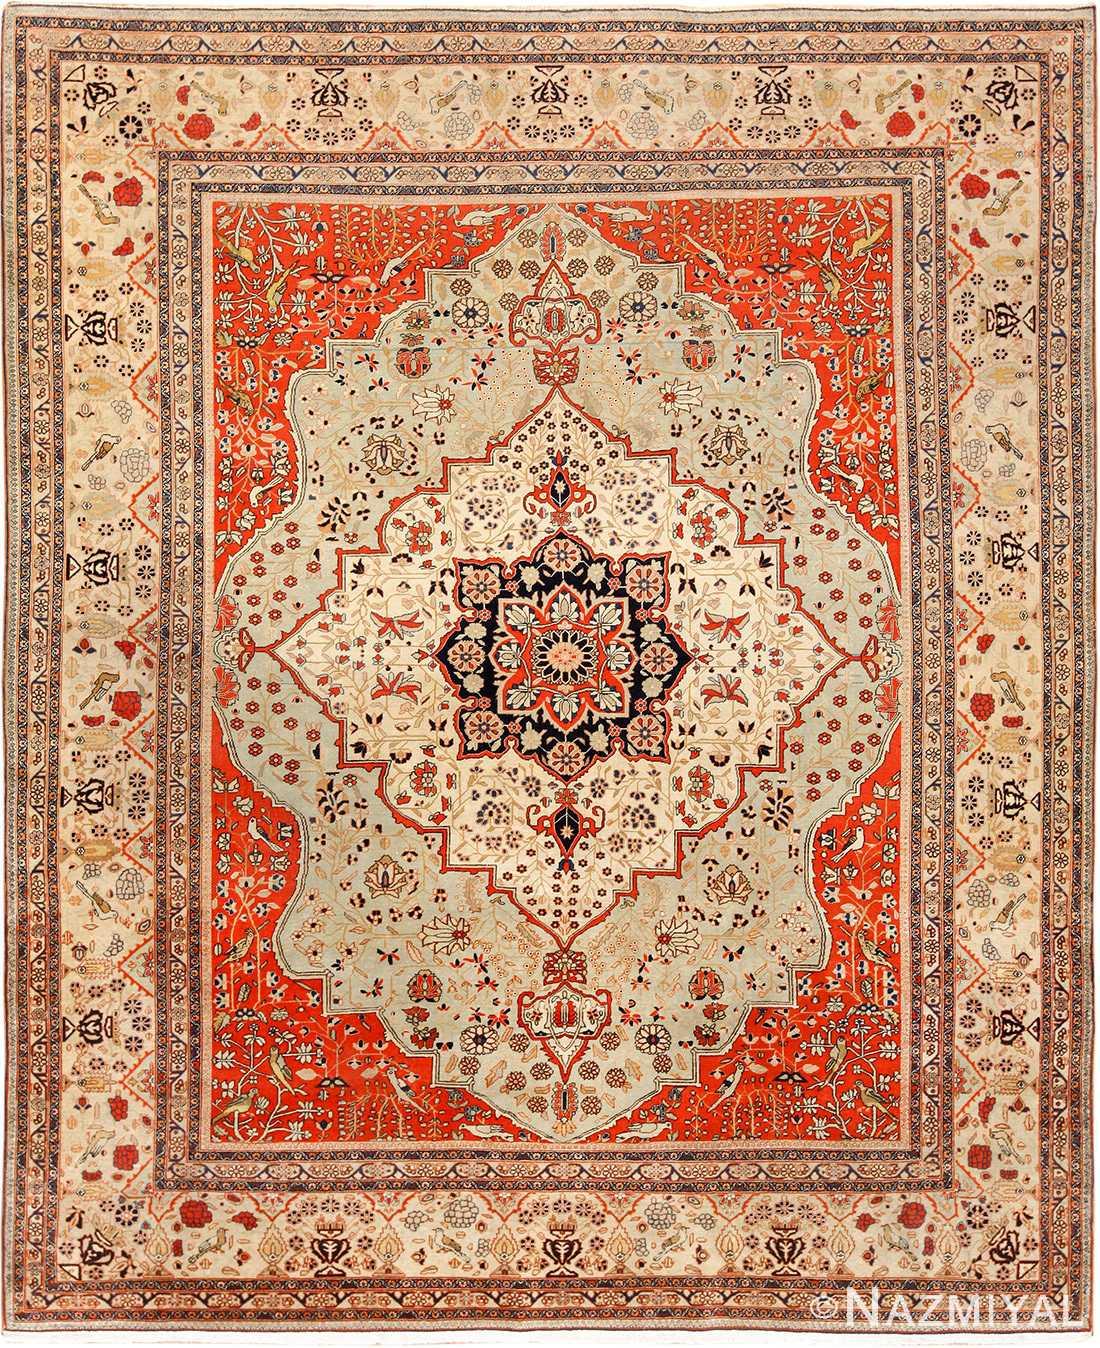 Antique Blue Persian Mohtasham Kashan Rug 49452 Nazmiyal Rugs